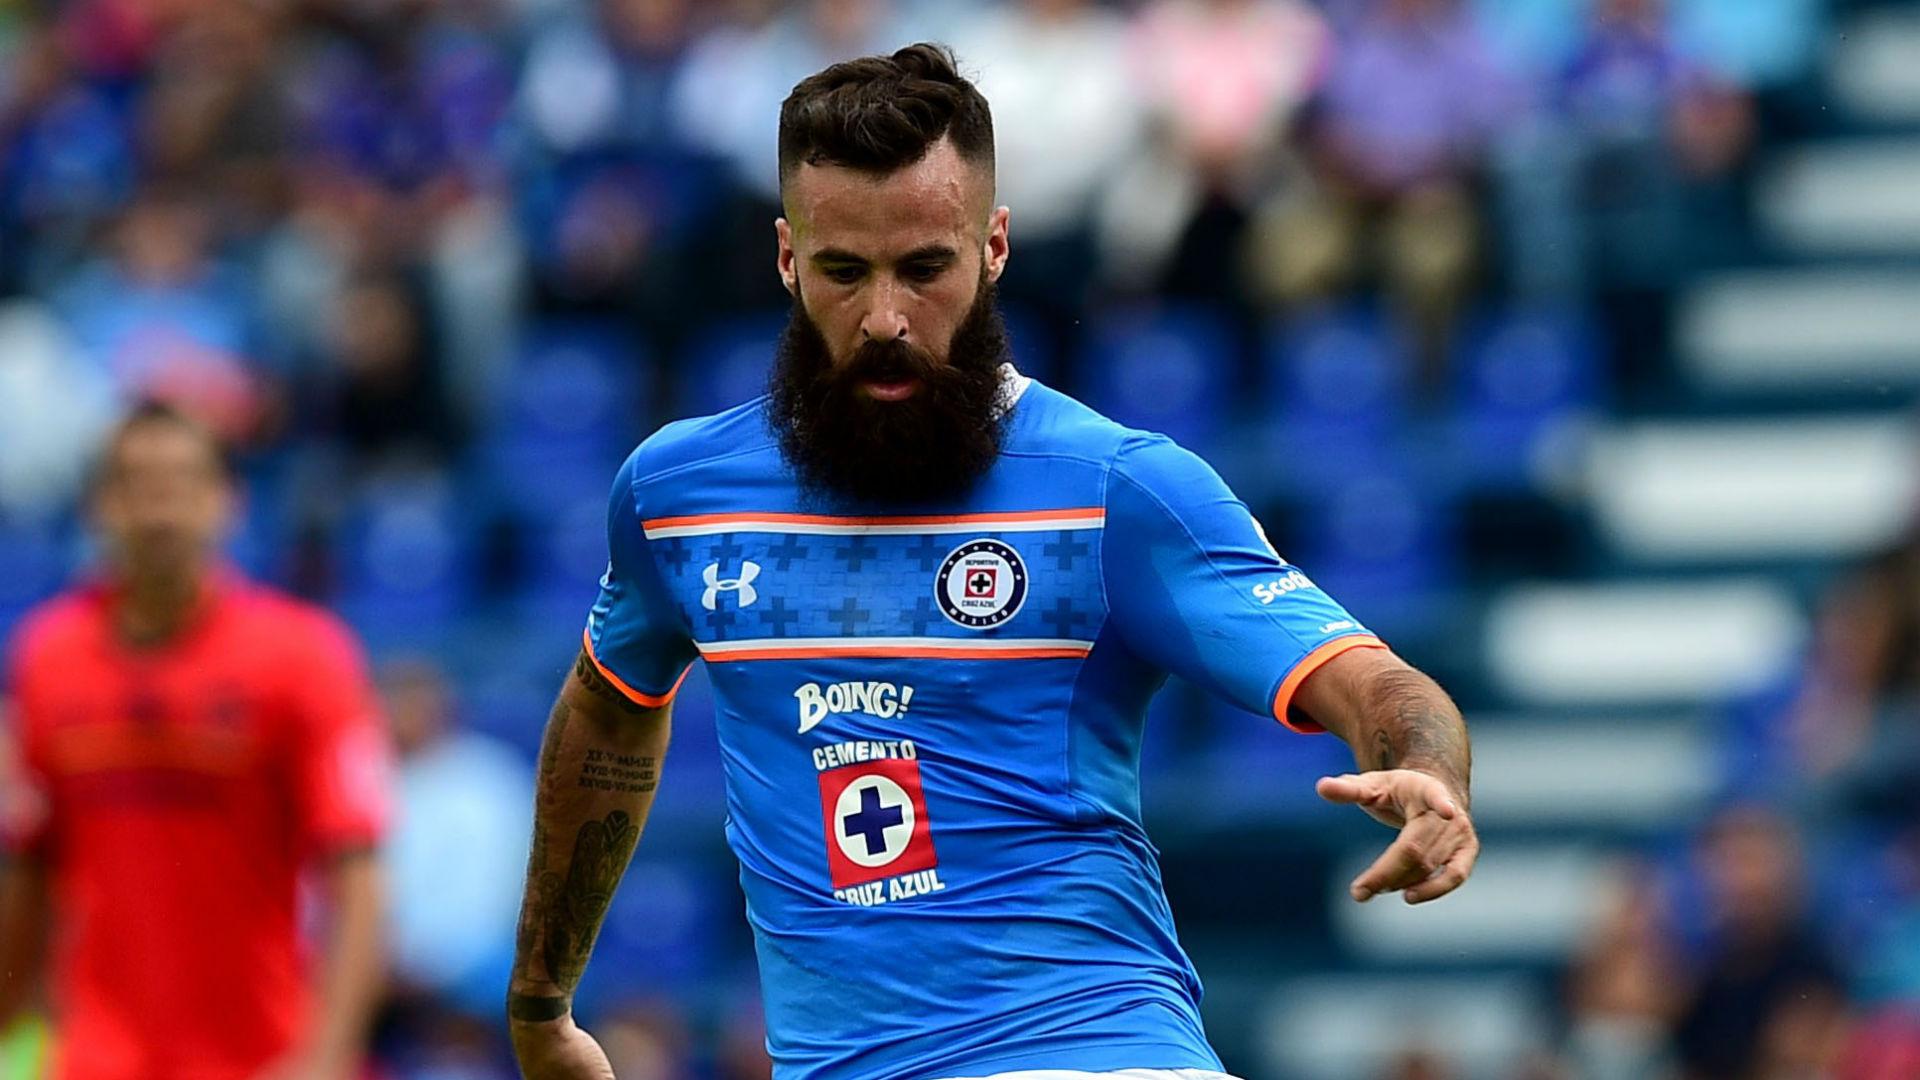 Football Quotes Wallpapers Hd Free Cruz Azul Backgrounds Pixelstalk Net